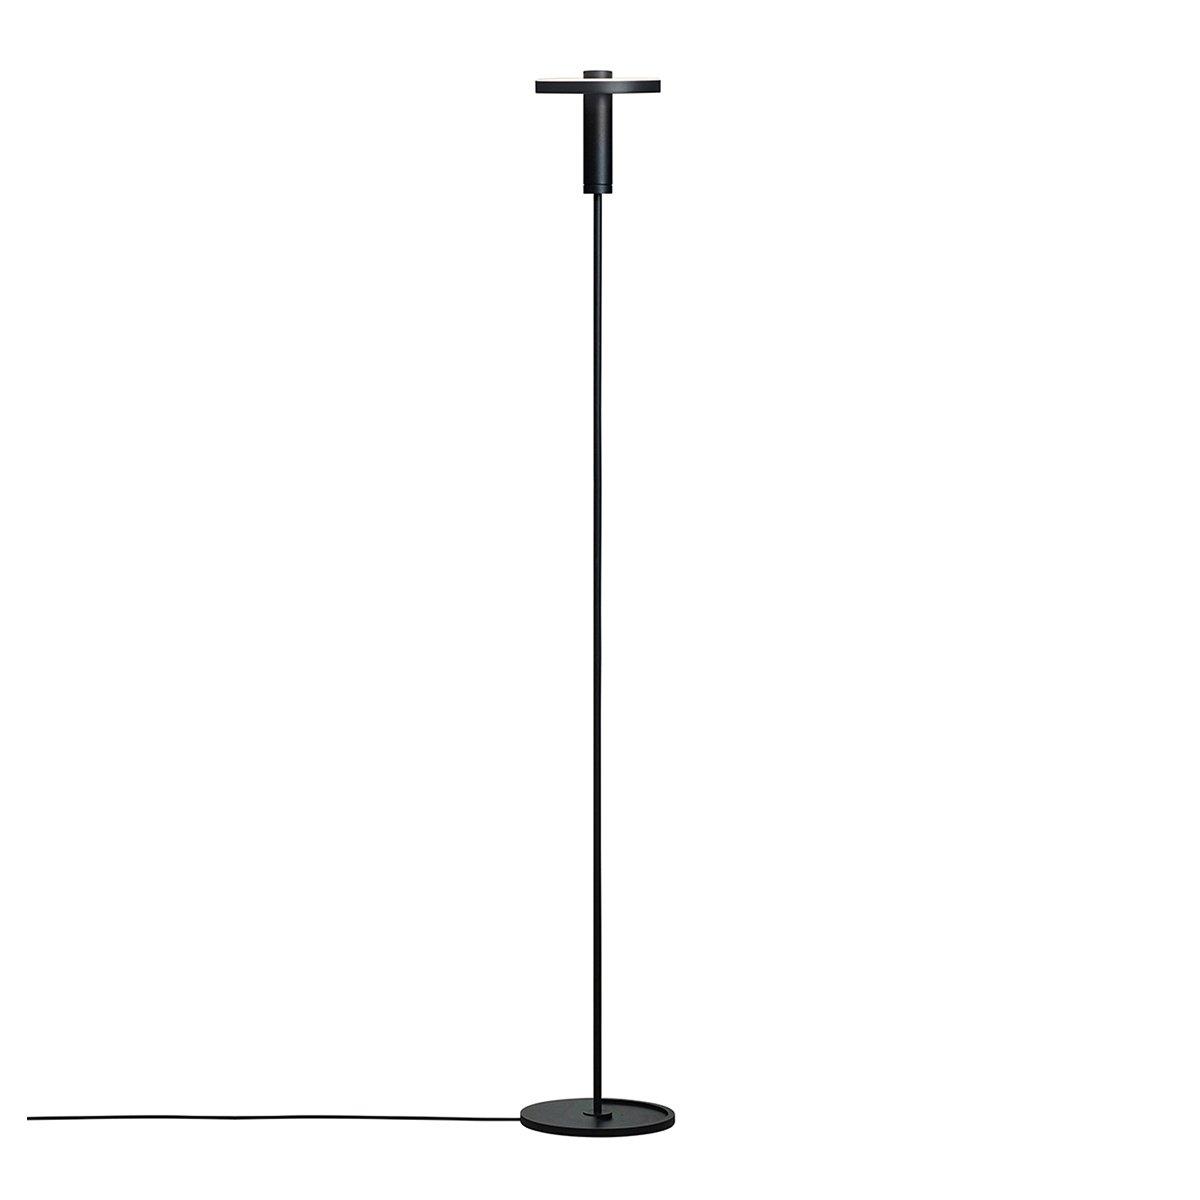 Tonone Beads Vloerlamp - Anton de Groof (2018)